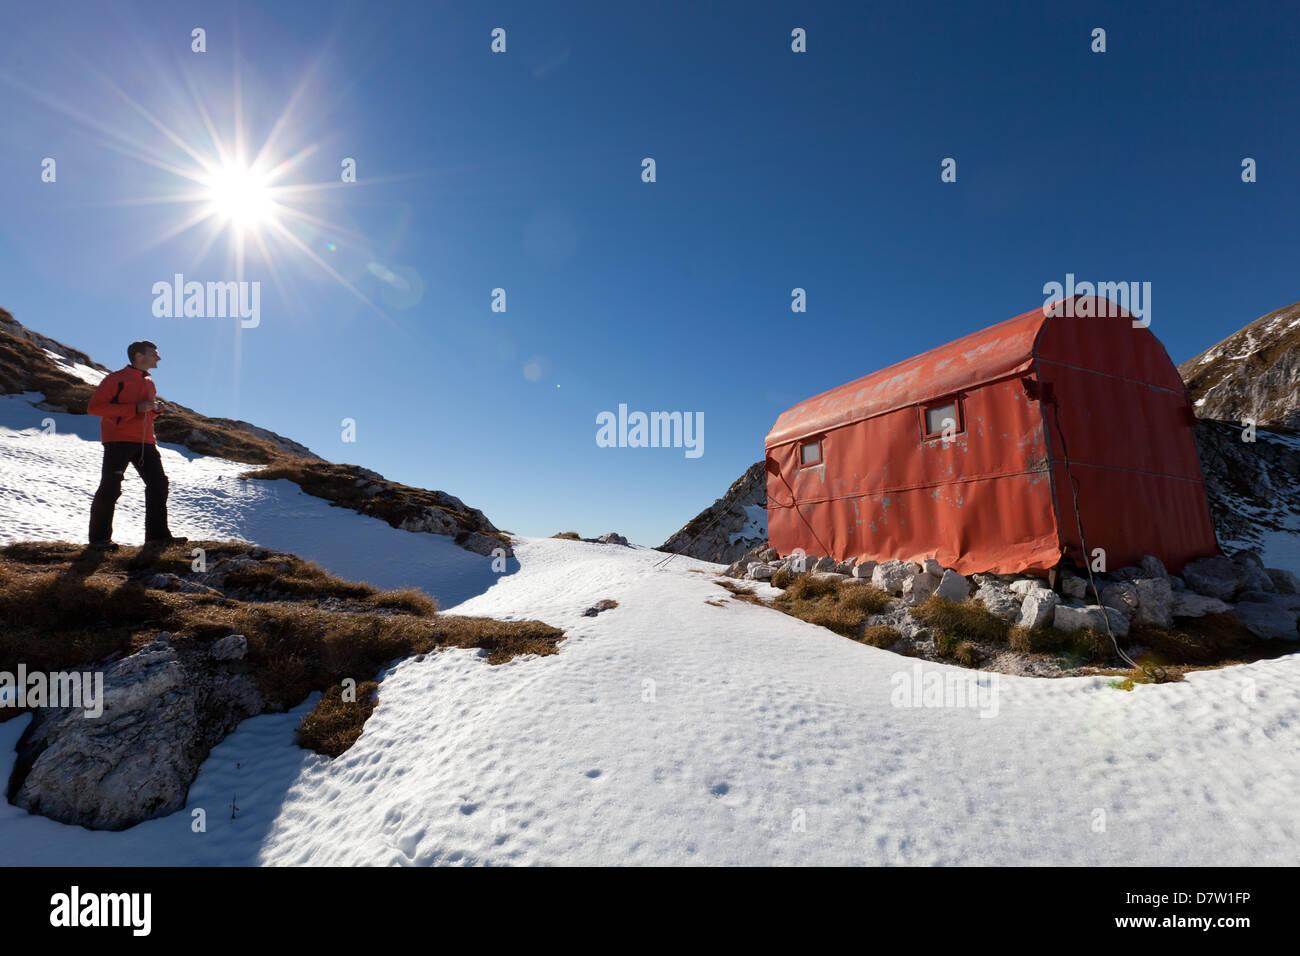 The winter shelter on Laste saddle, near Semenza refuge, Alpago, Belluno, Veneto, Italy - Stock Image